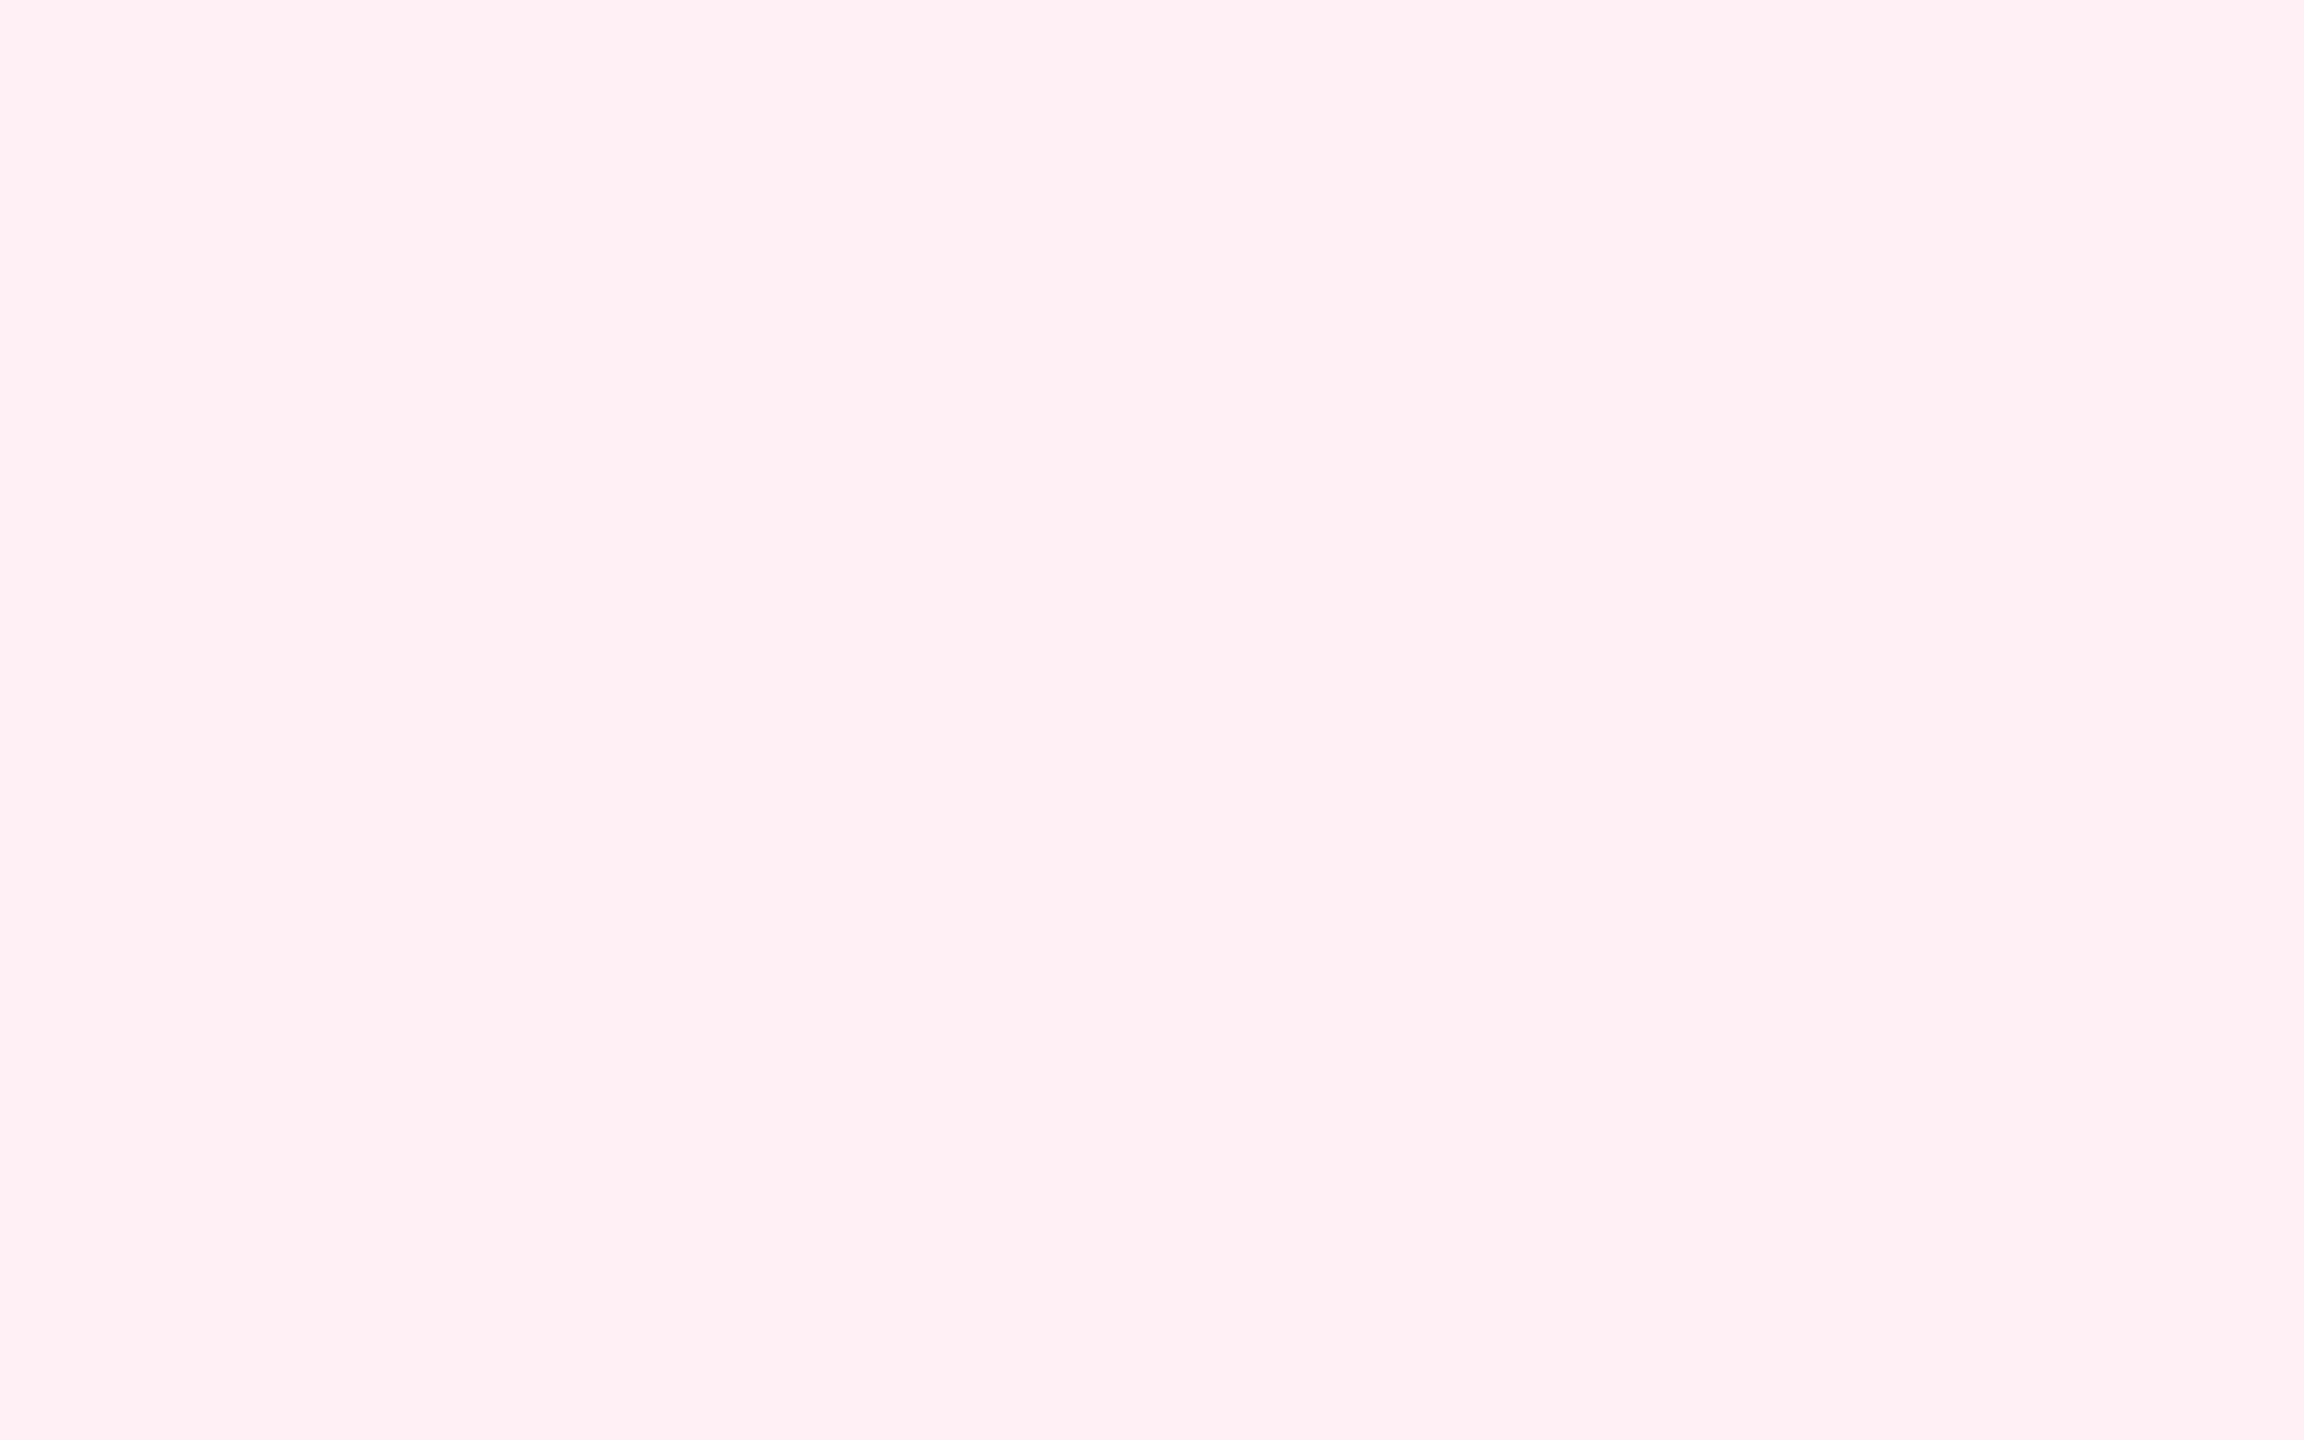 2304x1440 Lavender Blush Solid Color Background